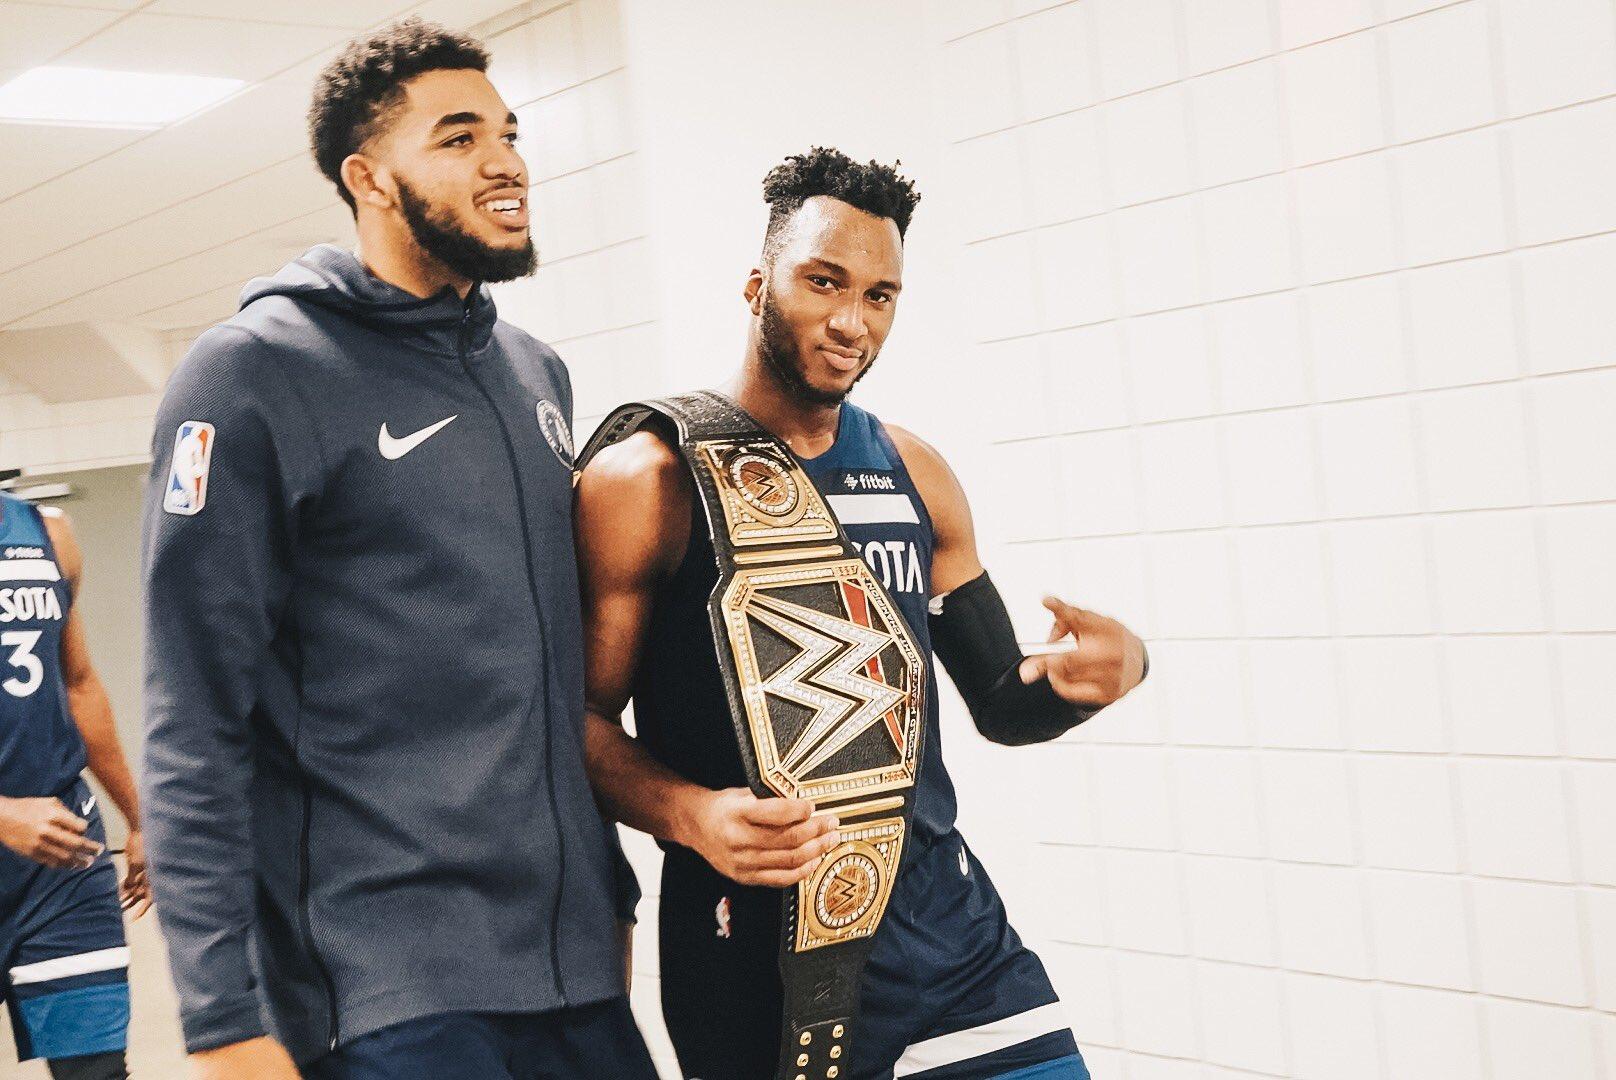 Okogie:Towns選擇走出家門為被害黑人伸張正義,向他致敬-黑特籃球-NBA新聞影音圖片分享社區